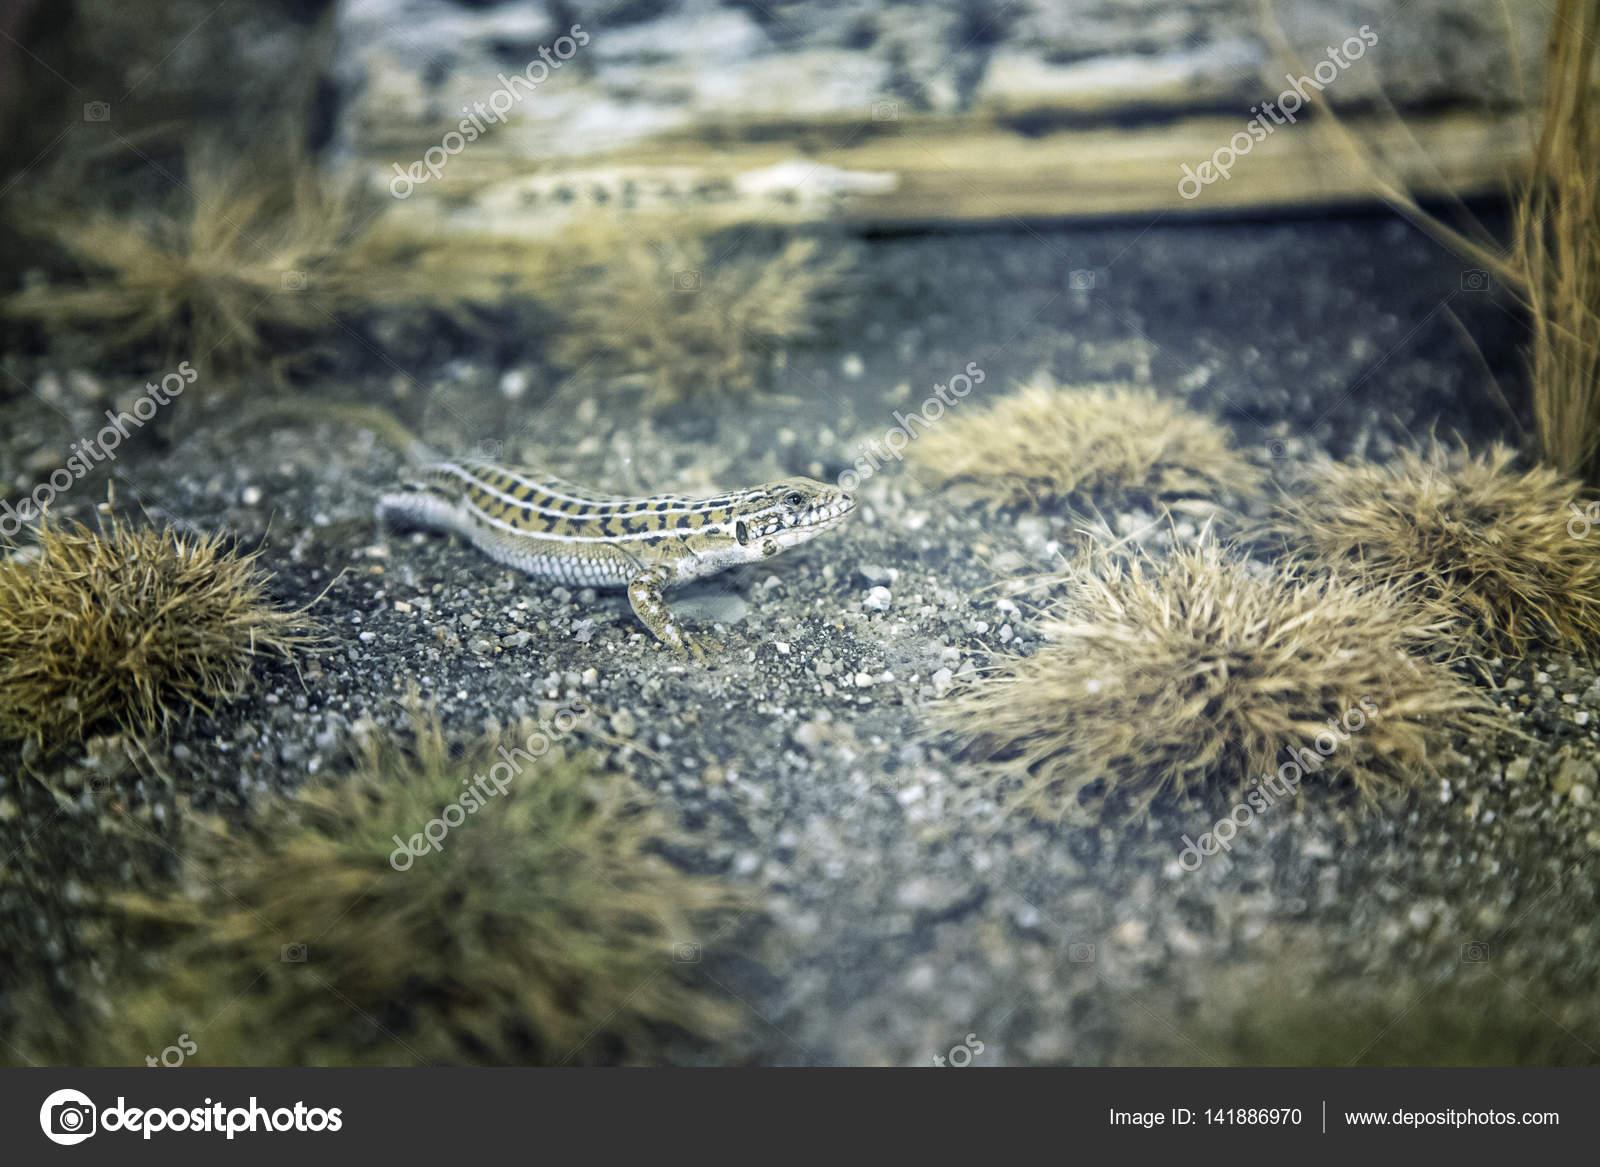 Lizard In Terrarium Stock Photo C Celiafoto 141886970